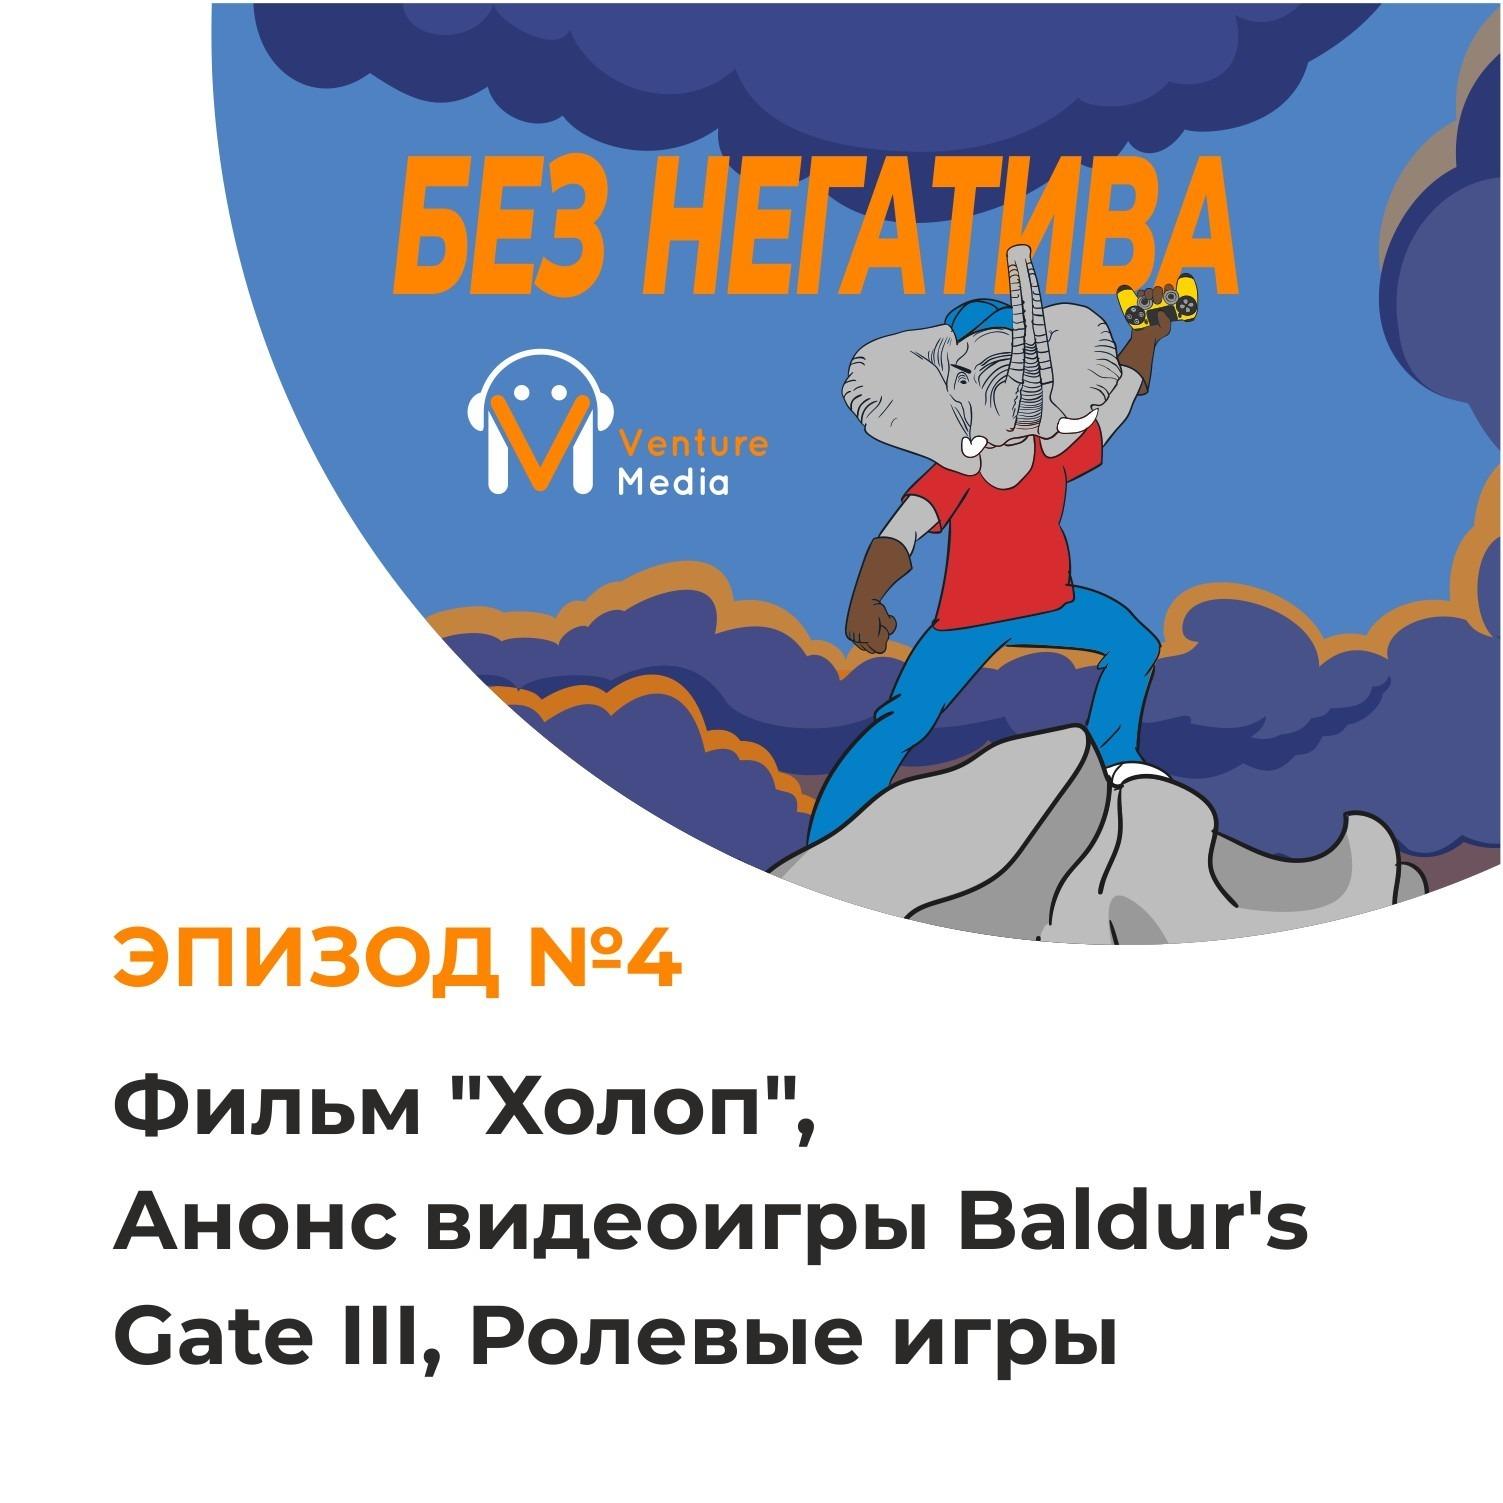 "Фильм ""Холоп"", Анонс видеоигры Baldur's Gate III"